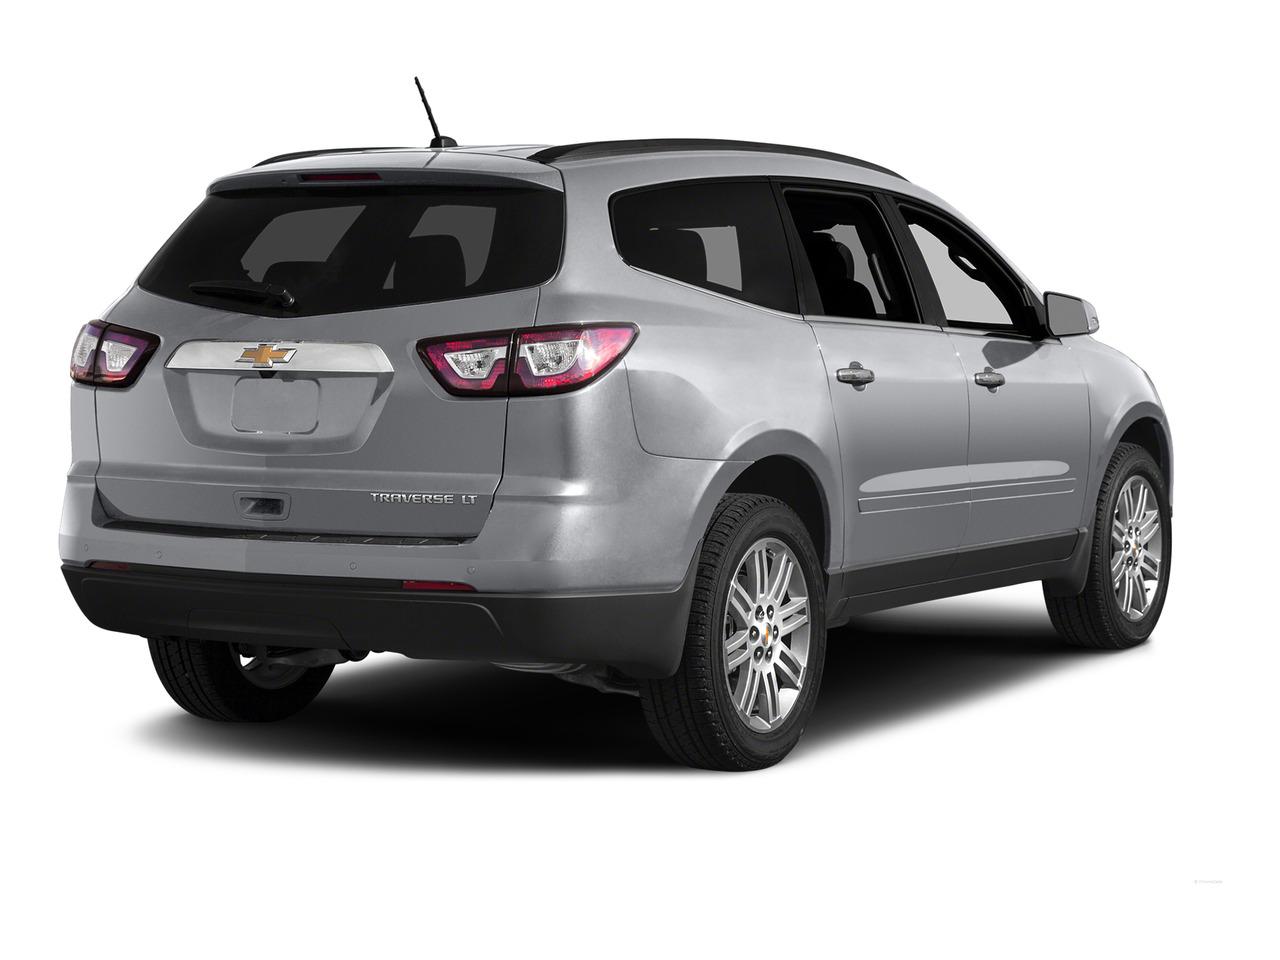 2015 Chevrolet Traverse 2LT SUV Slide